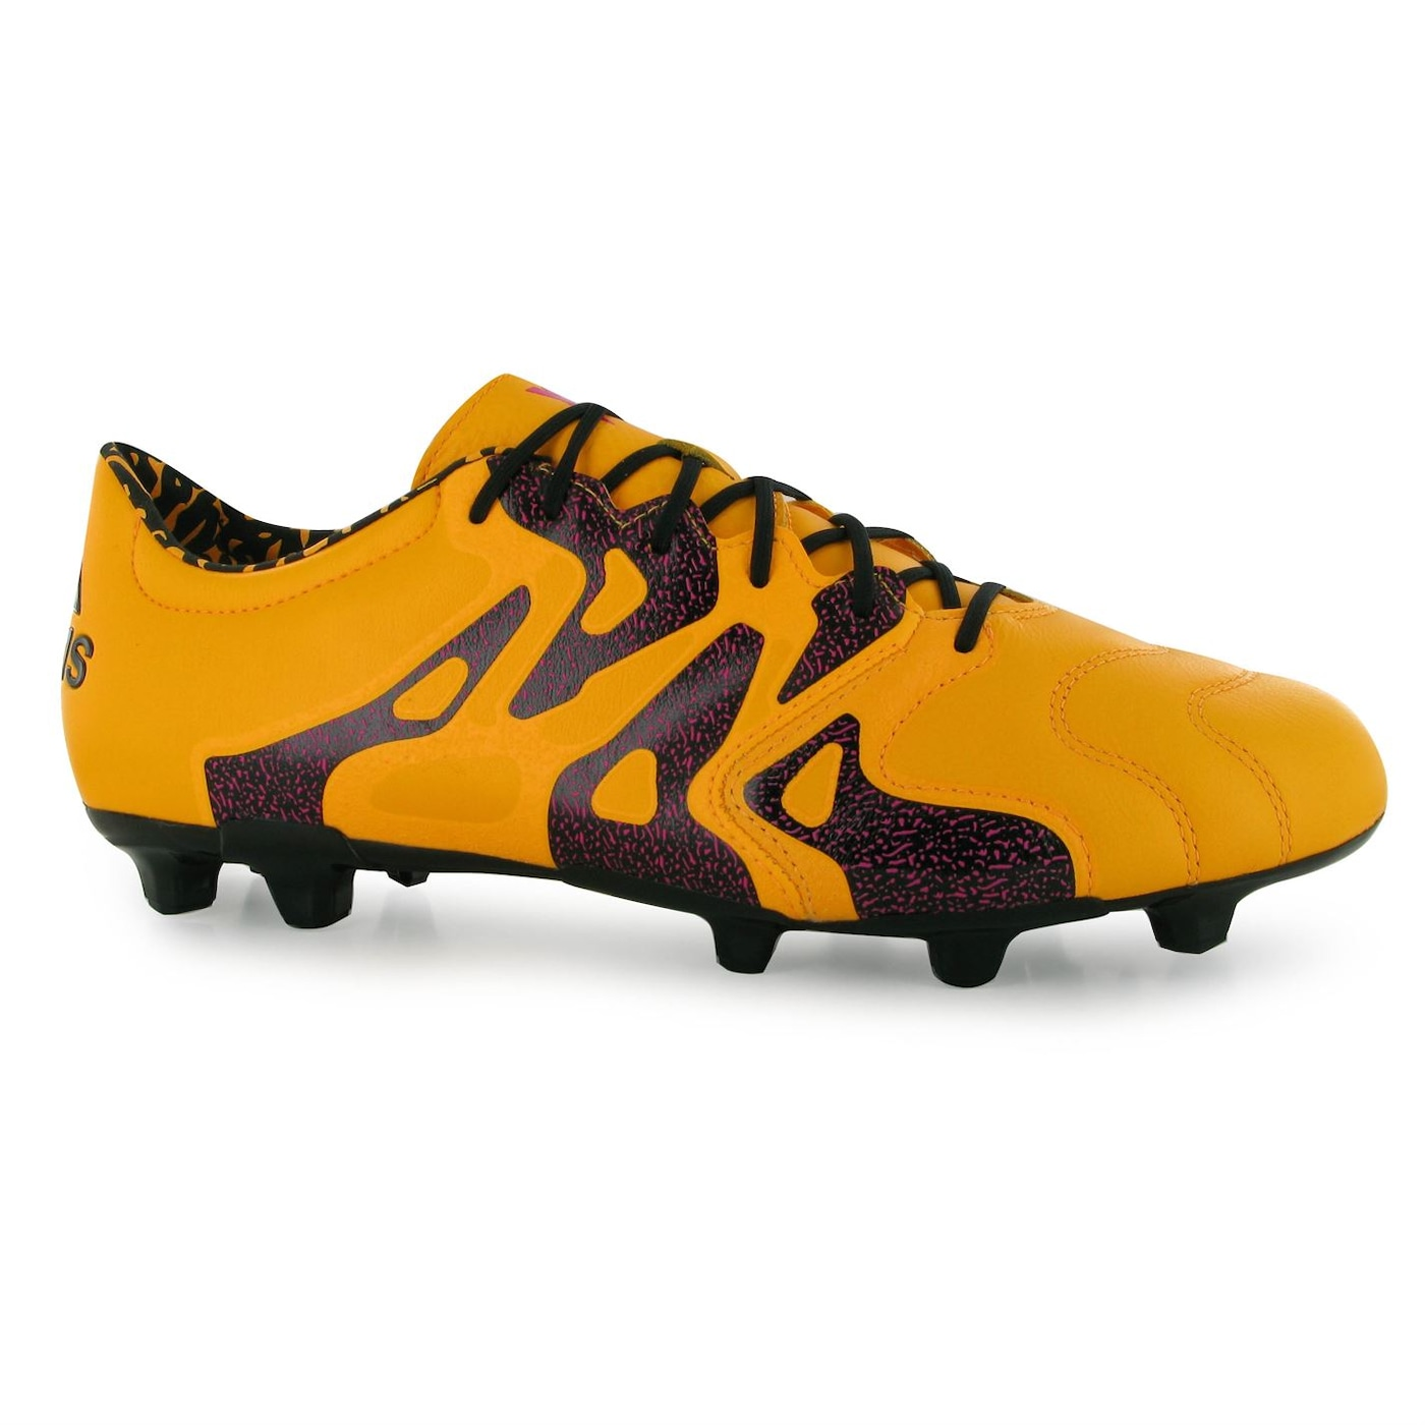 Adidas X 15.2 Leather FG Mens Football Boots